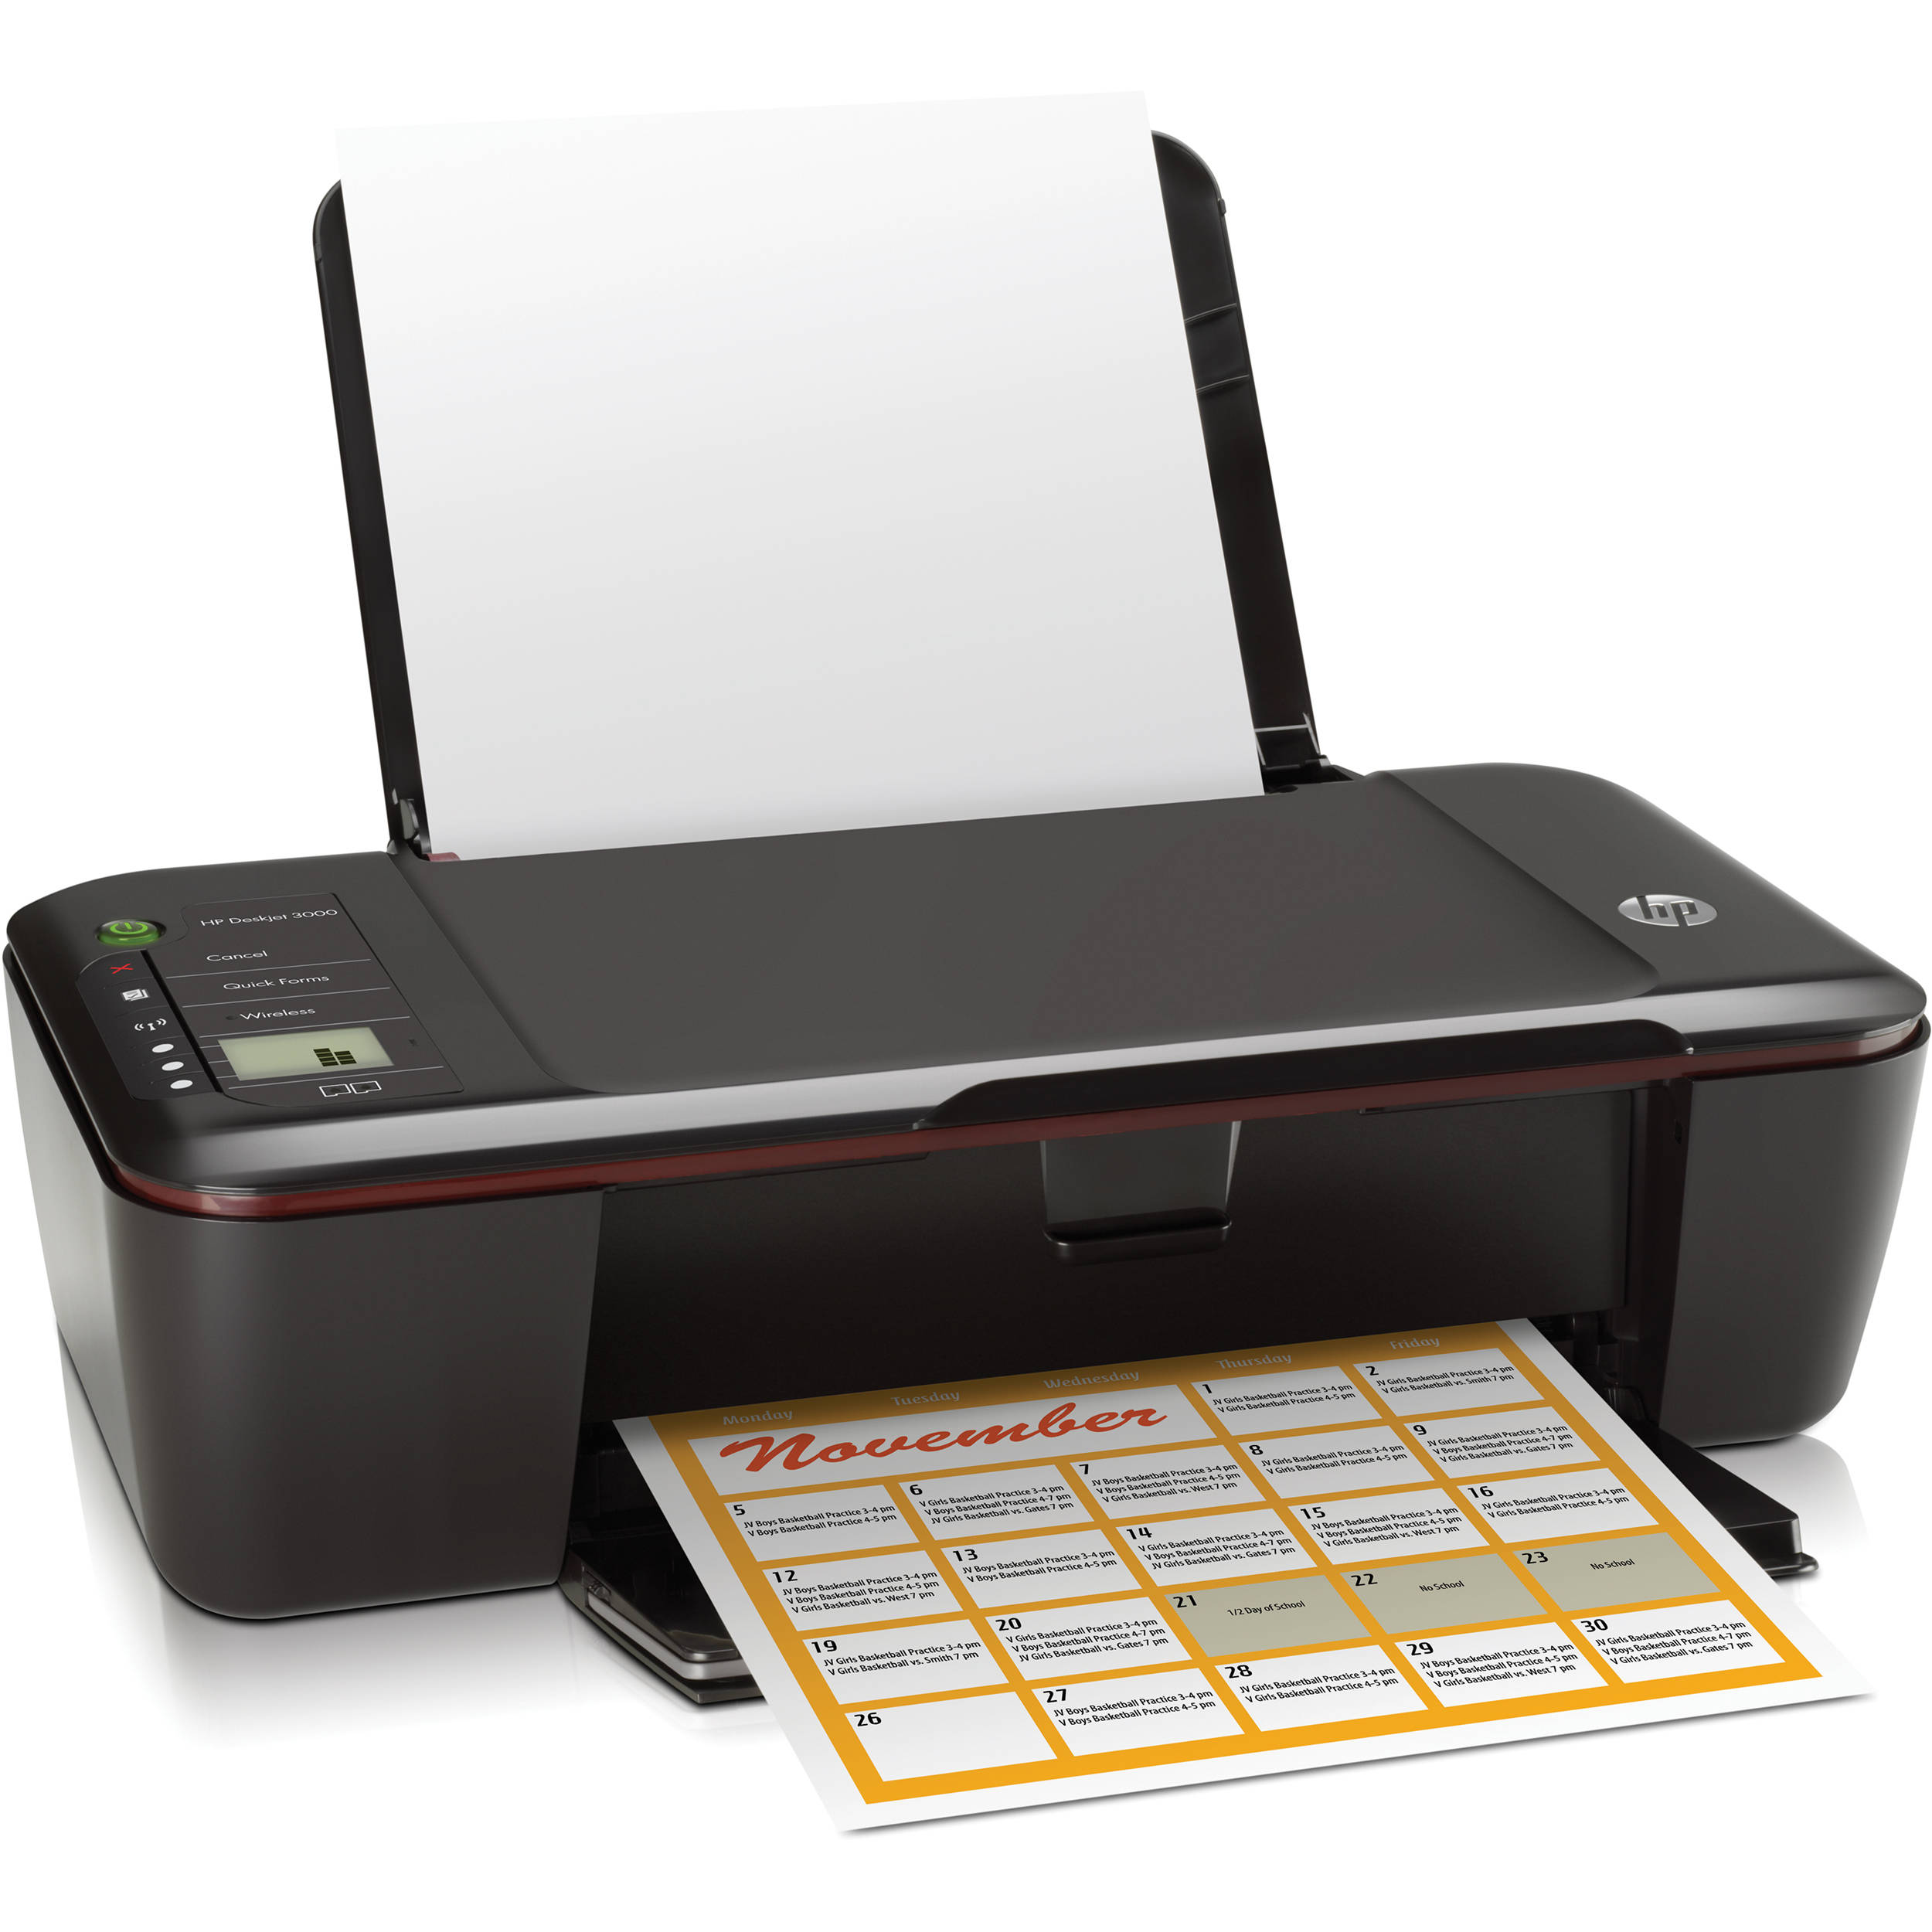 hp deskjet 3000 wireless color inkjet printer ch393a b1h b h rh bhphotovideo com HP Printer Deskjet 3000 J310a HP 3000 Printer Ink